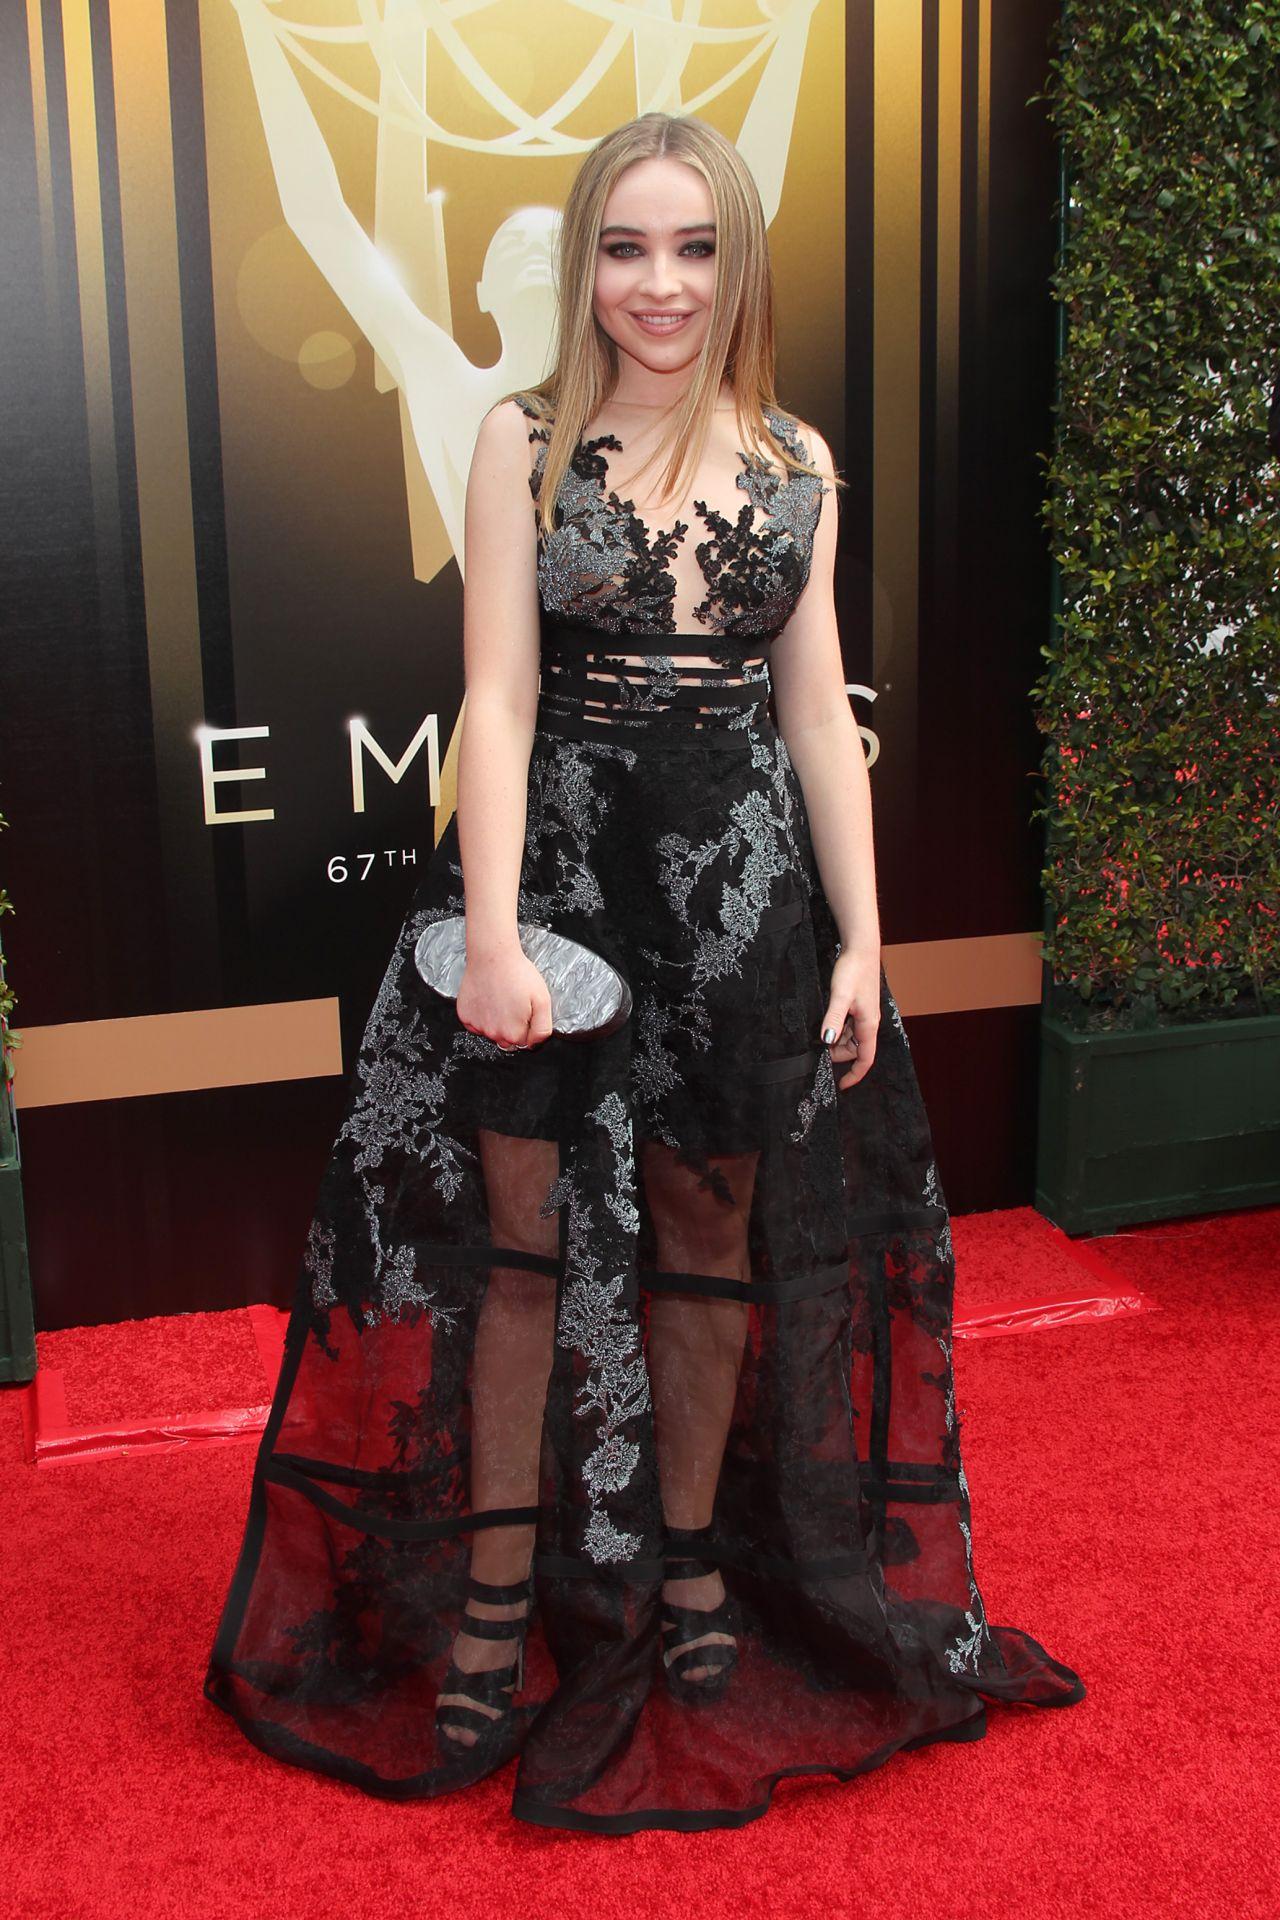 2015 Los Angeles Film Festival: 2015 Creative Arts Emmy Awards In Los